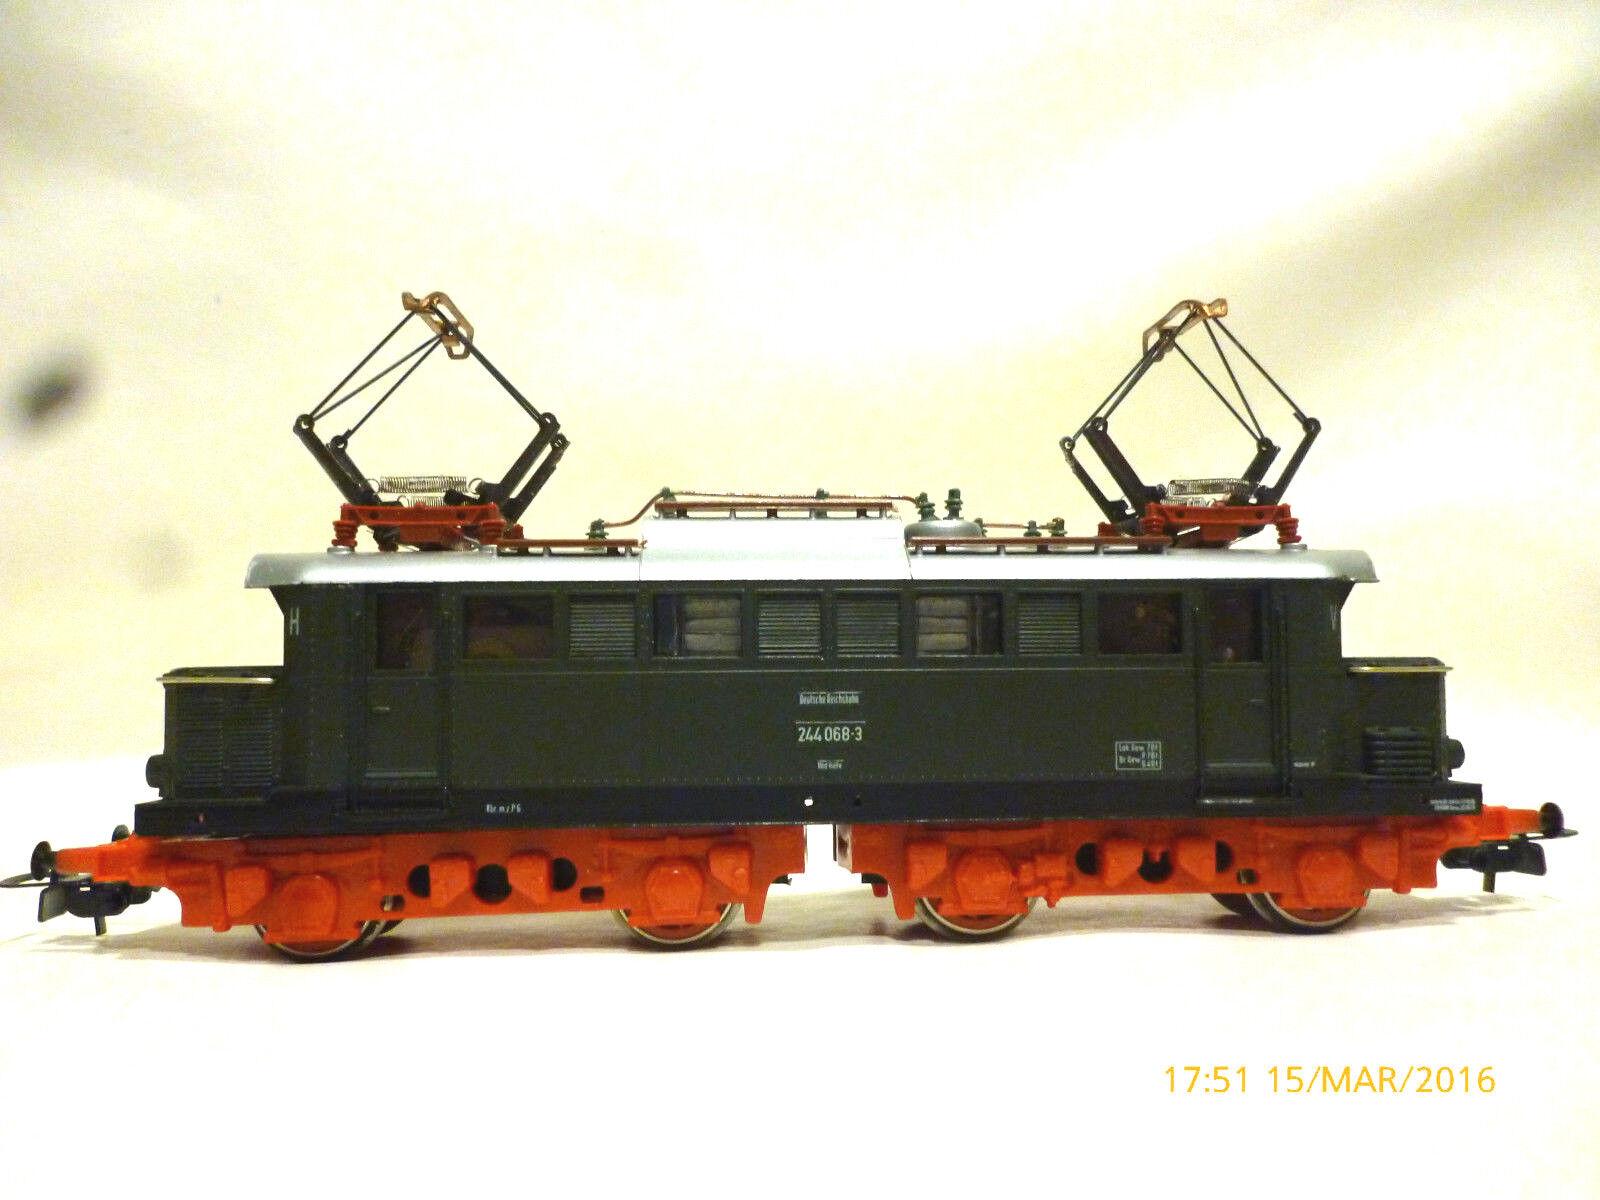 Locomotore elettrico scala ho modello 5 6211